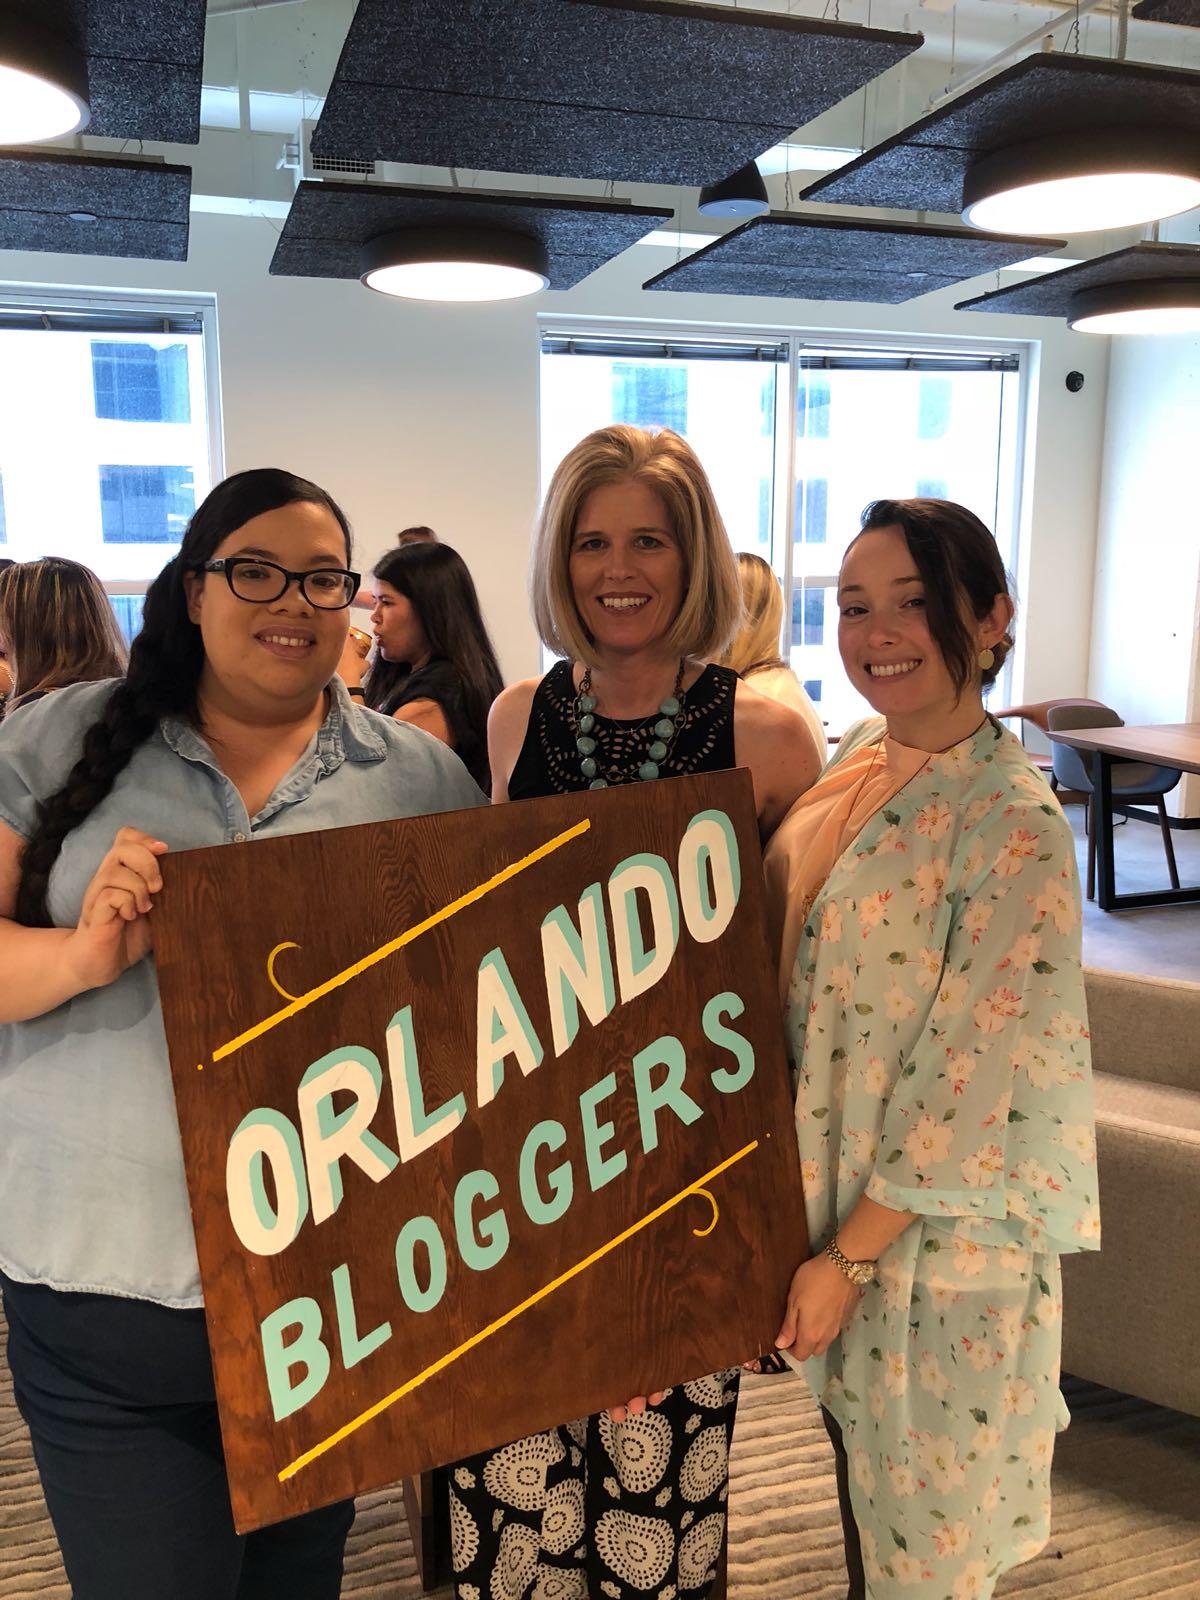 Orlando Bloggers June 2018 Meetup Angie Curcio speaker about Facebook Live